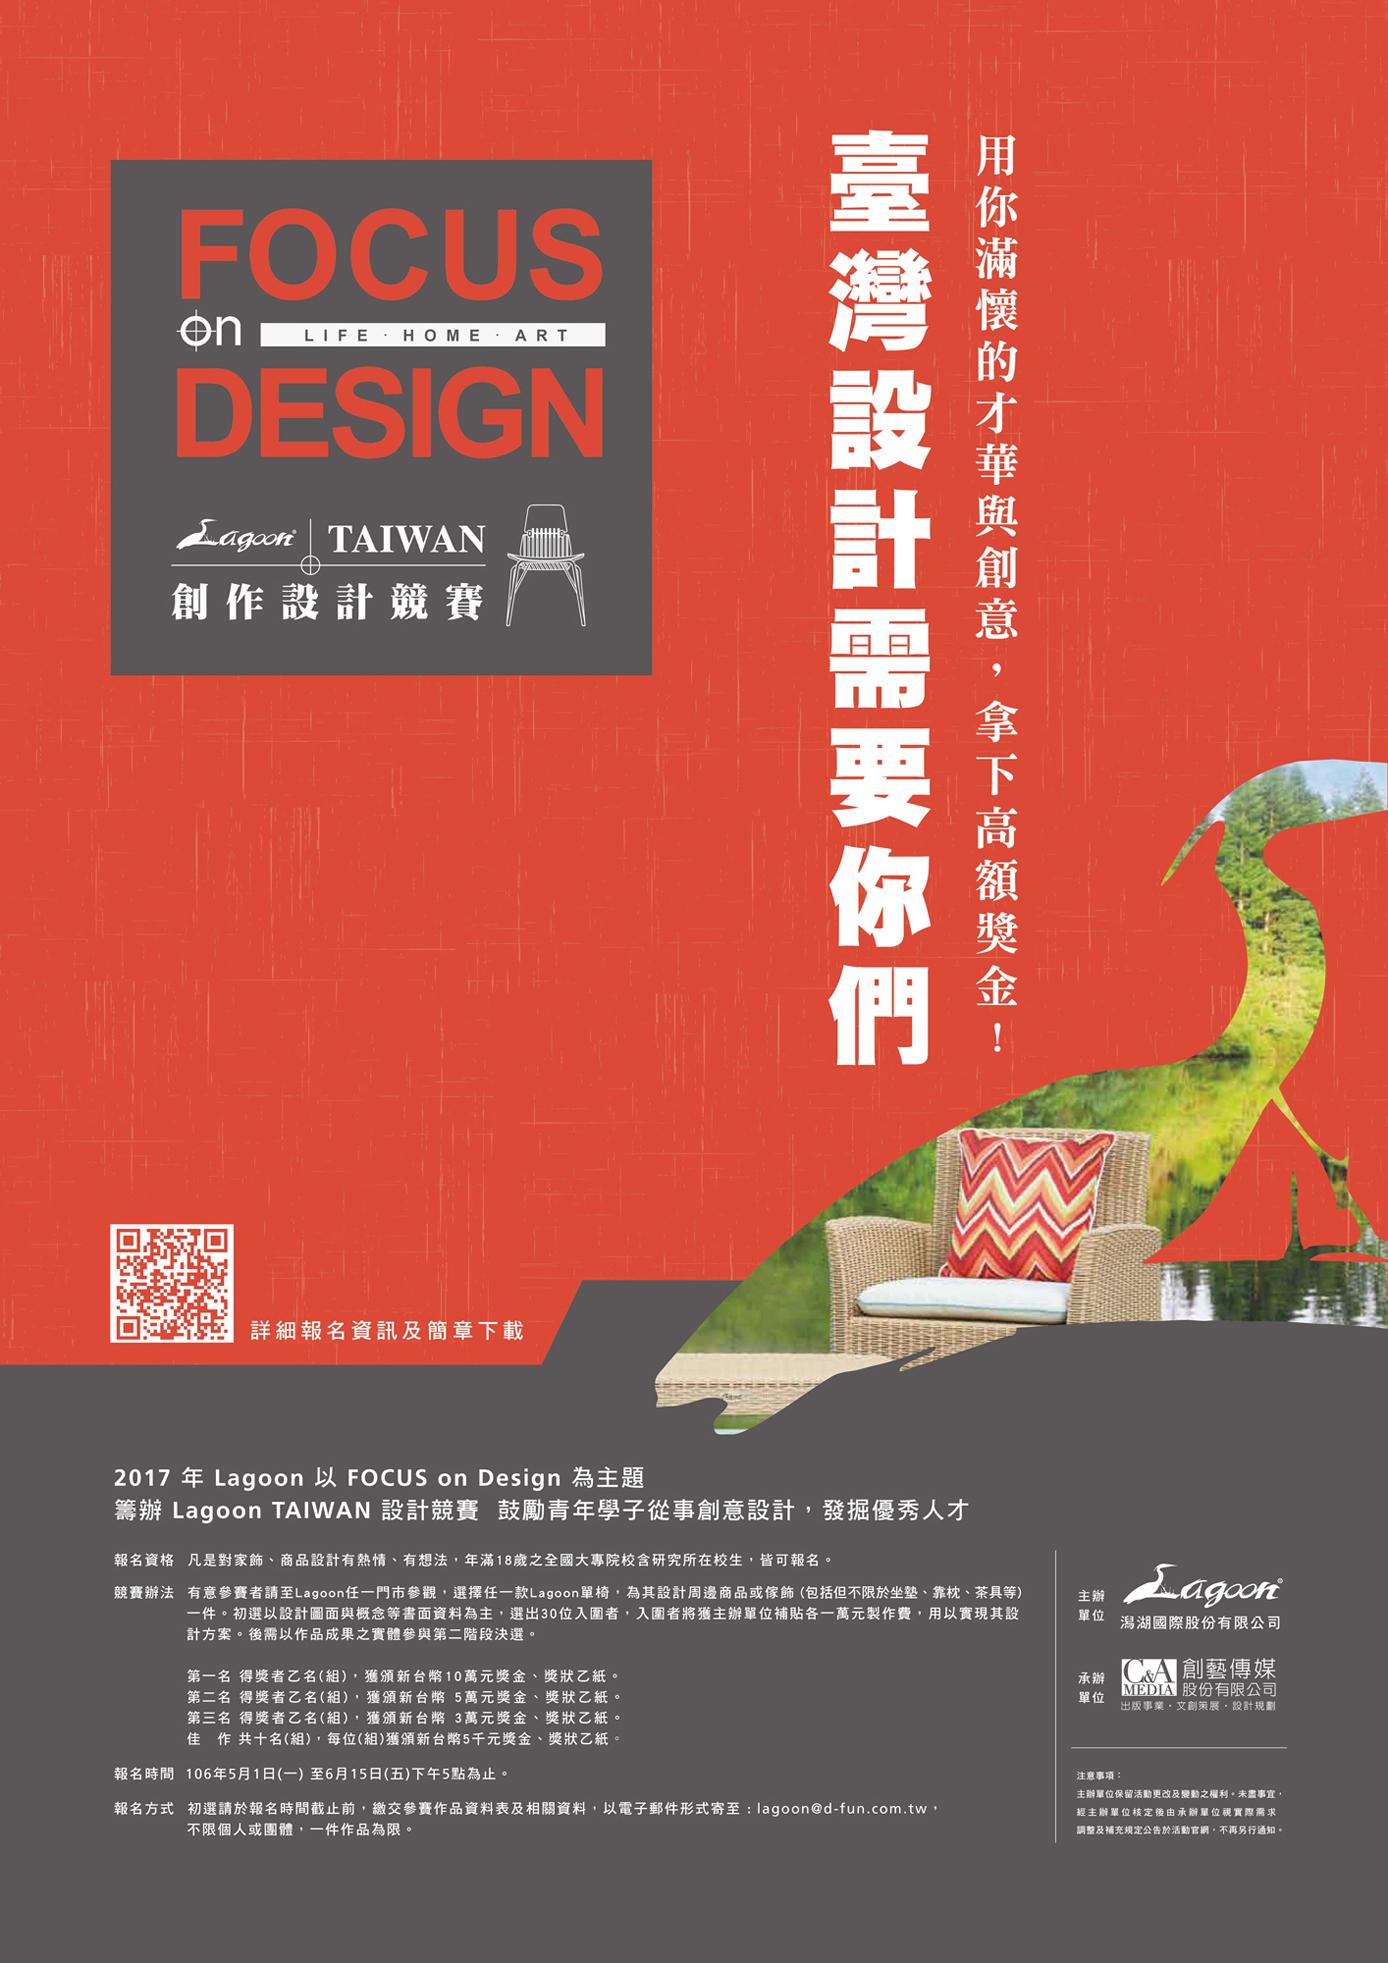 2017 LAGOON 創作設計競賽-海報